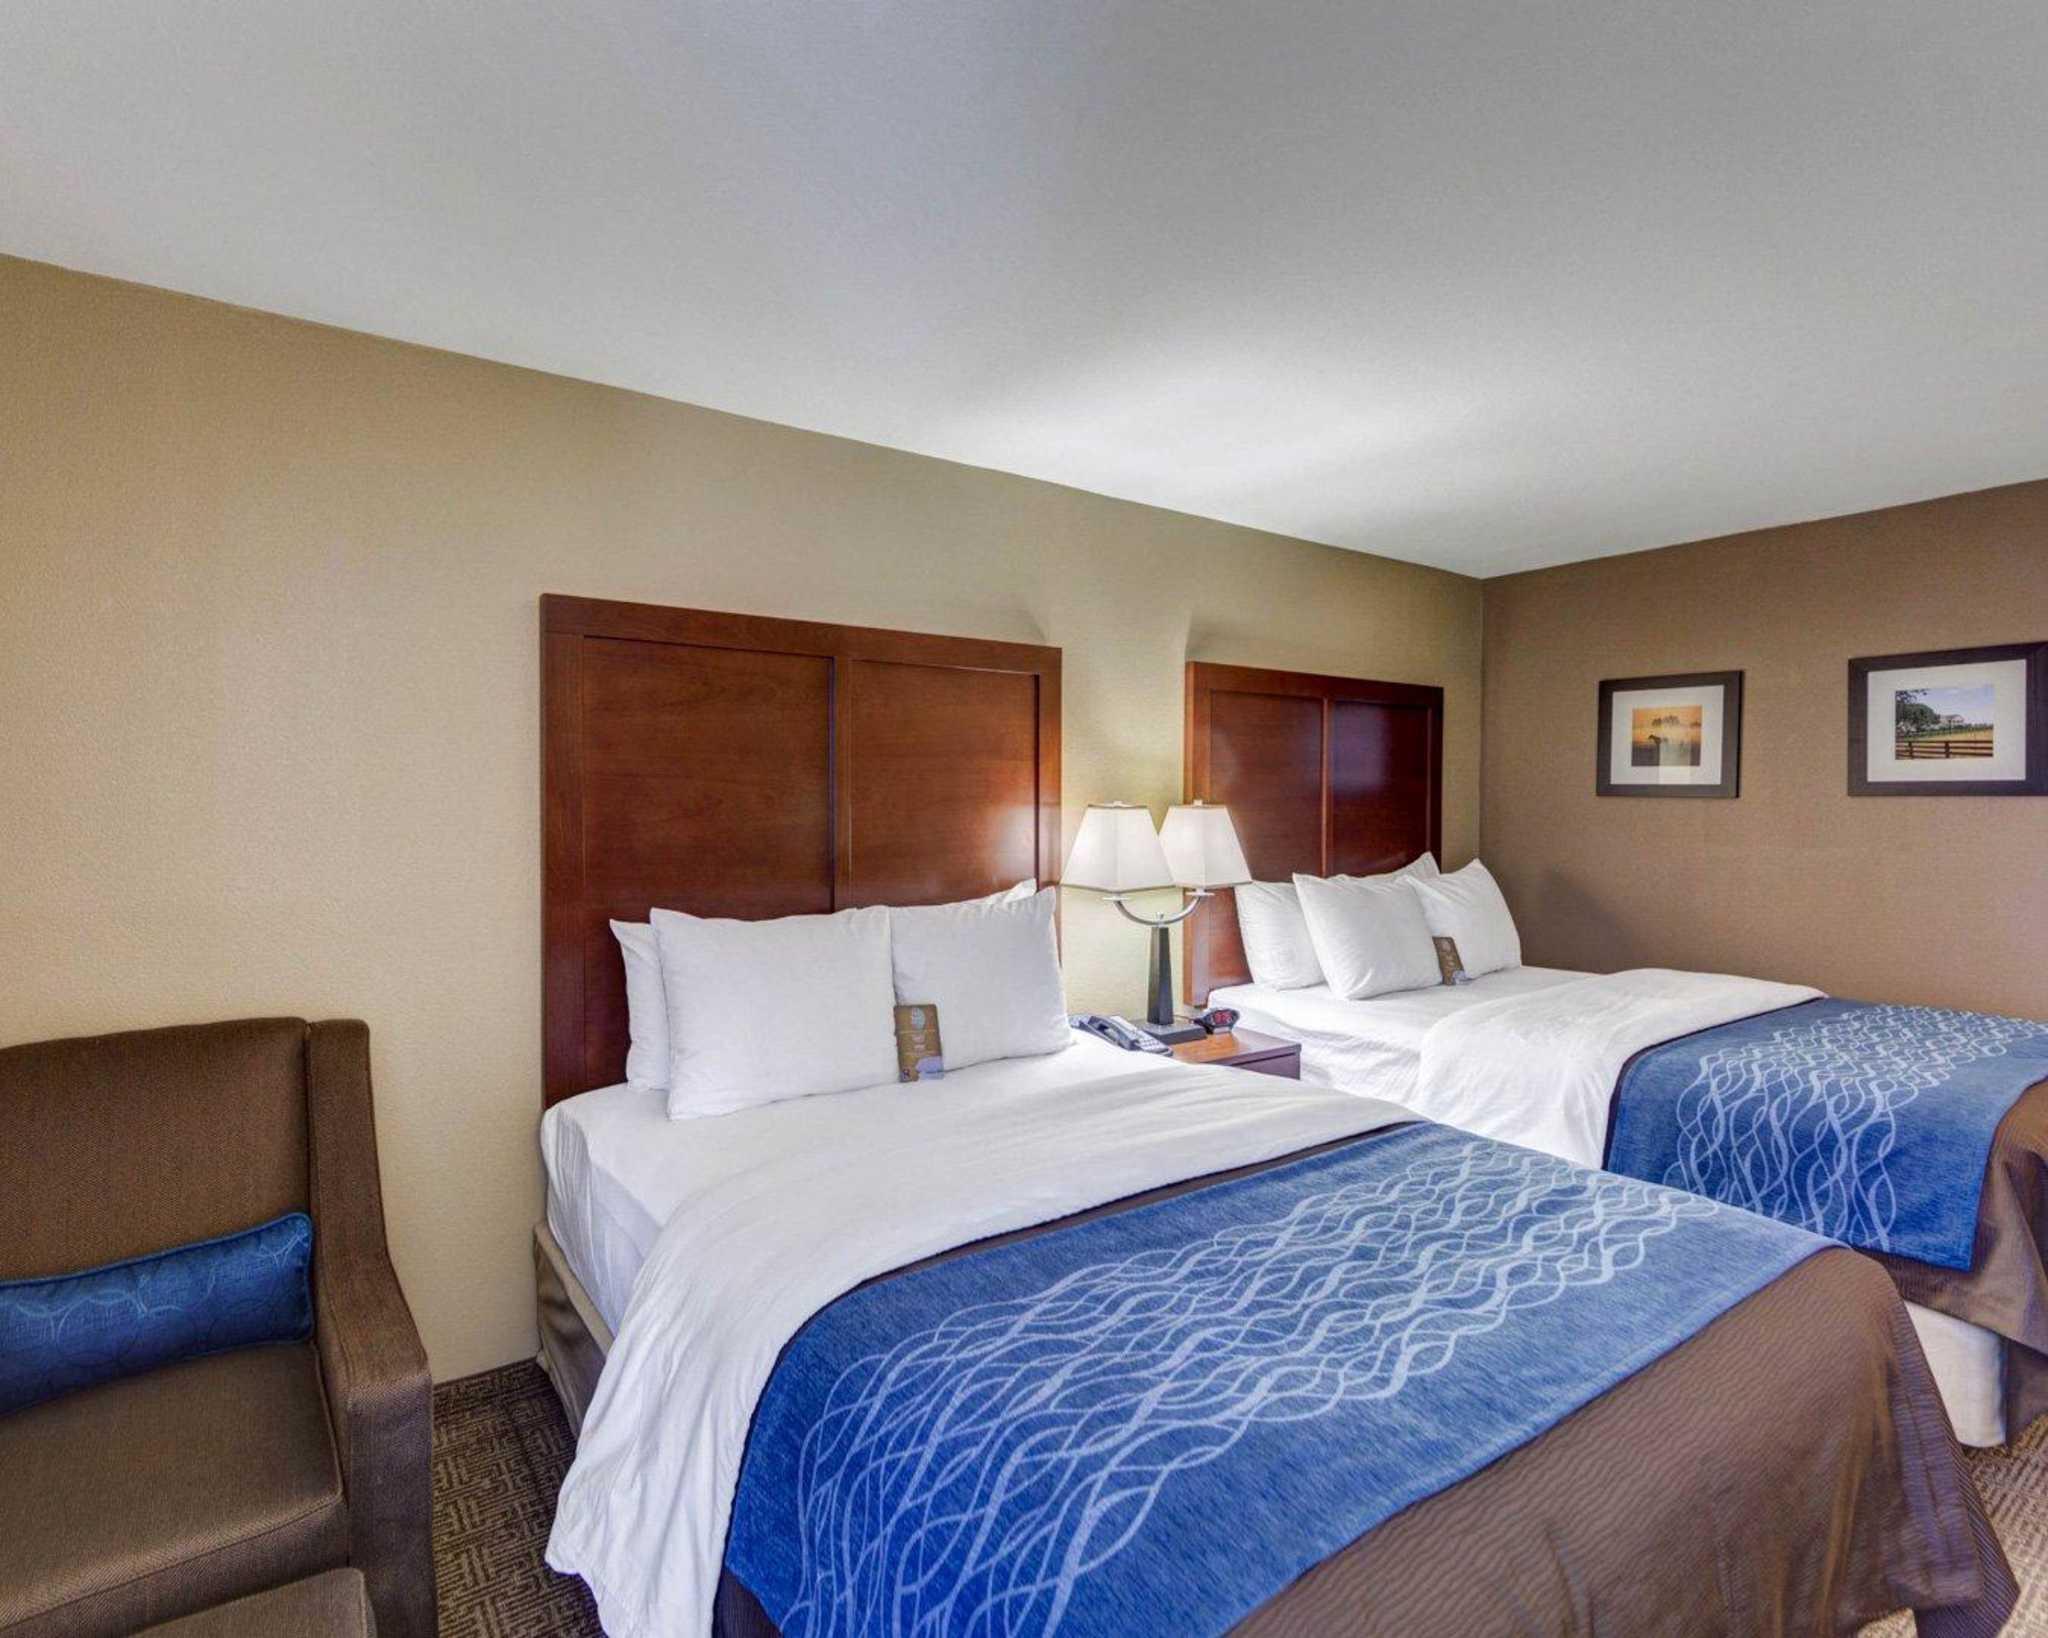 Comfort Inn & Suites Plano East image 45